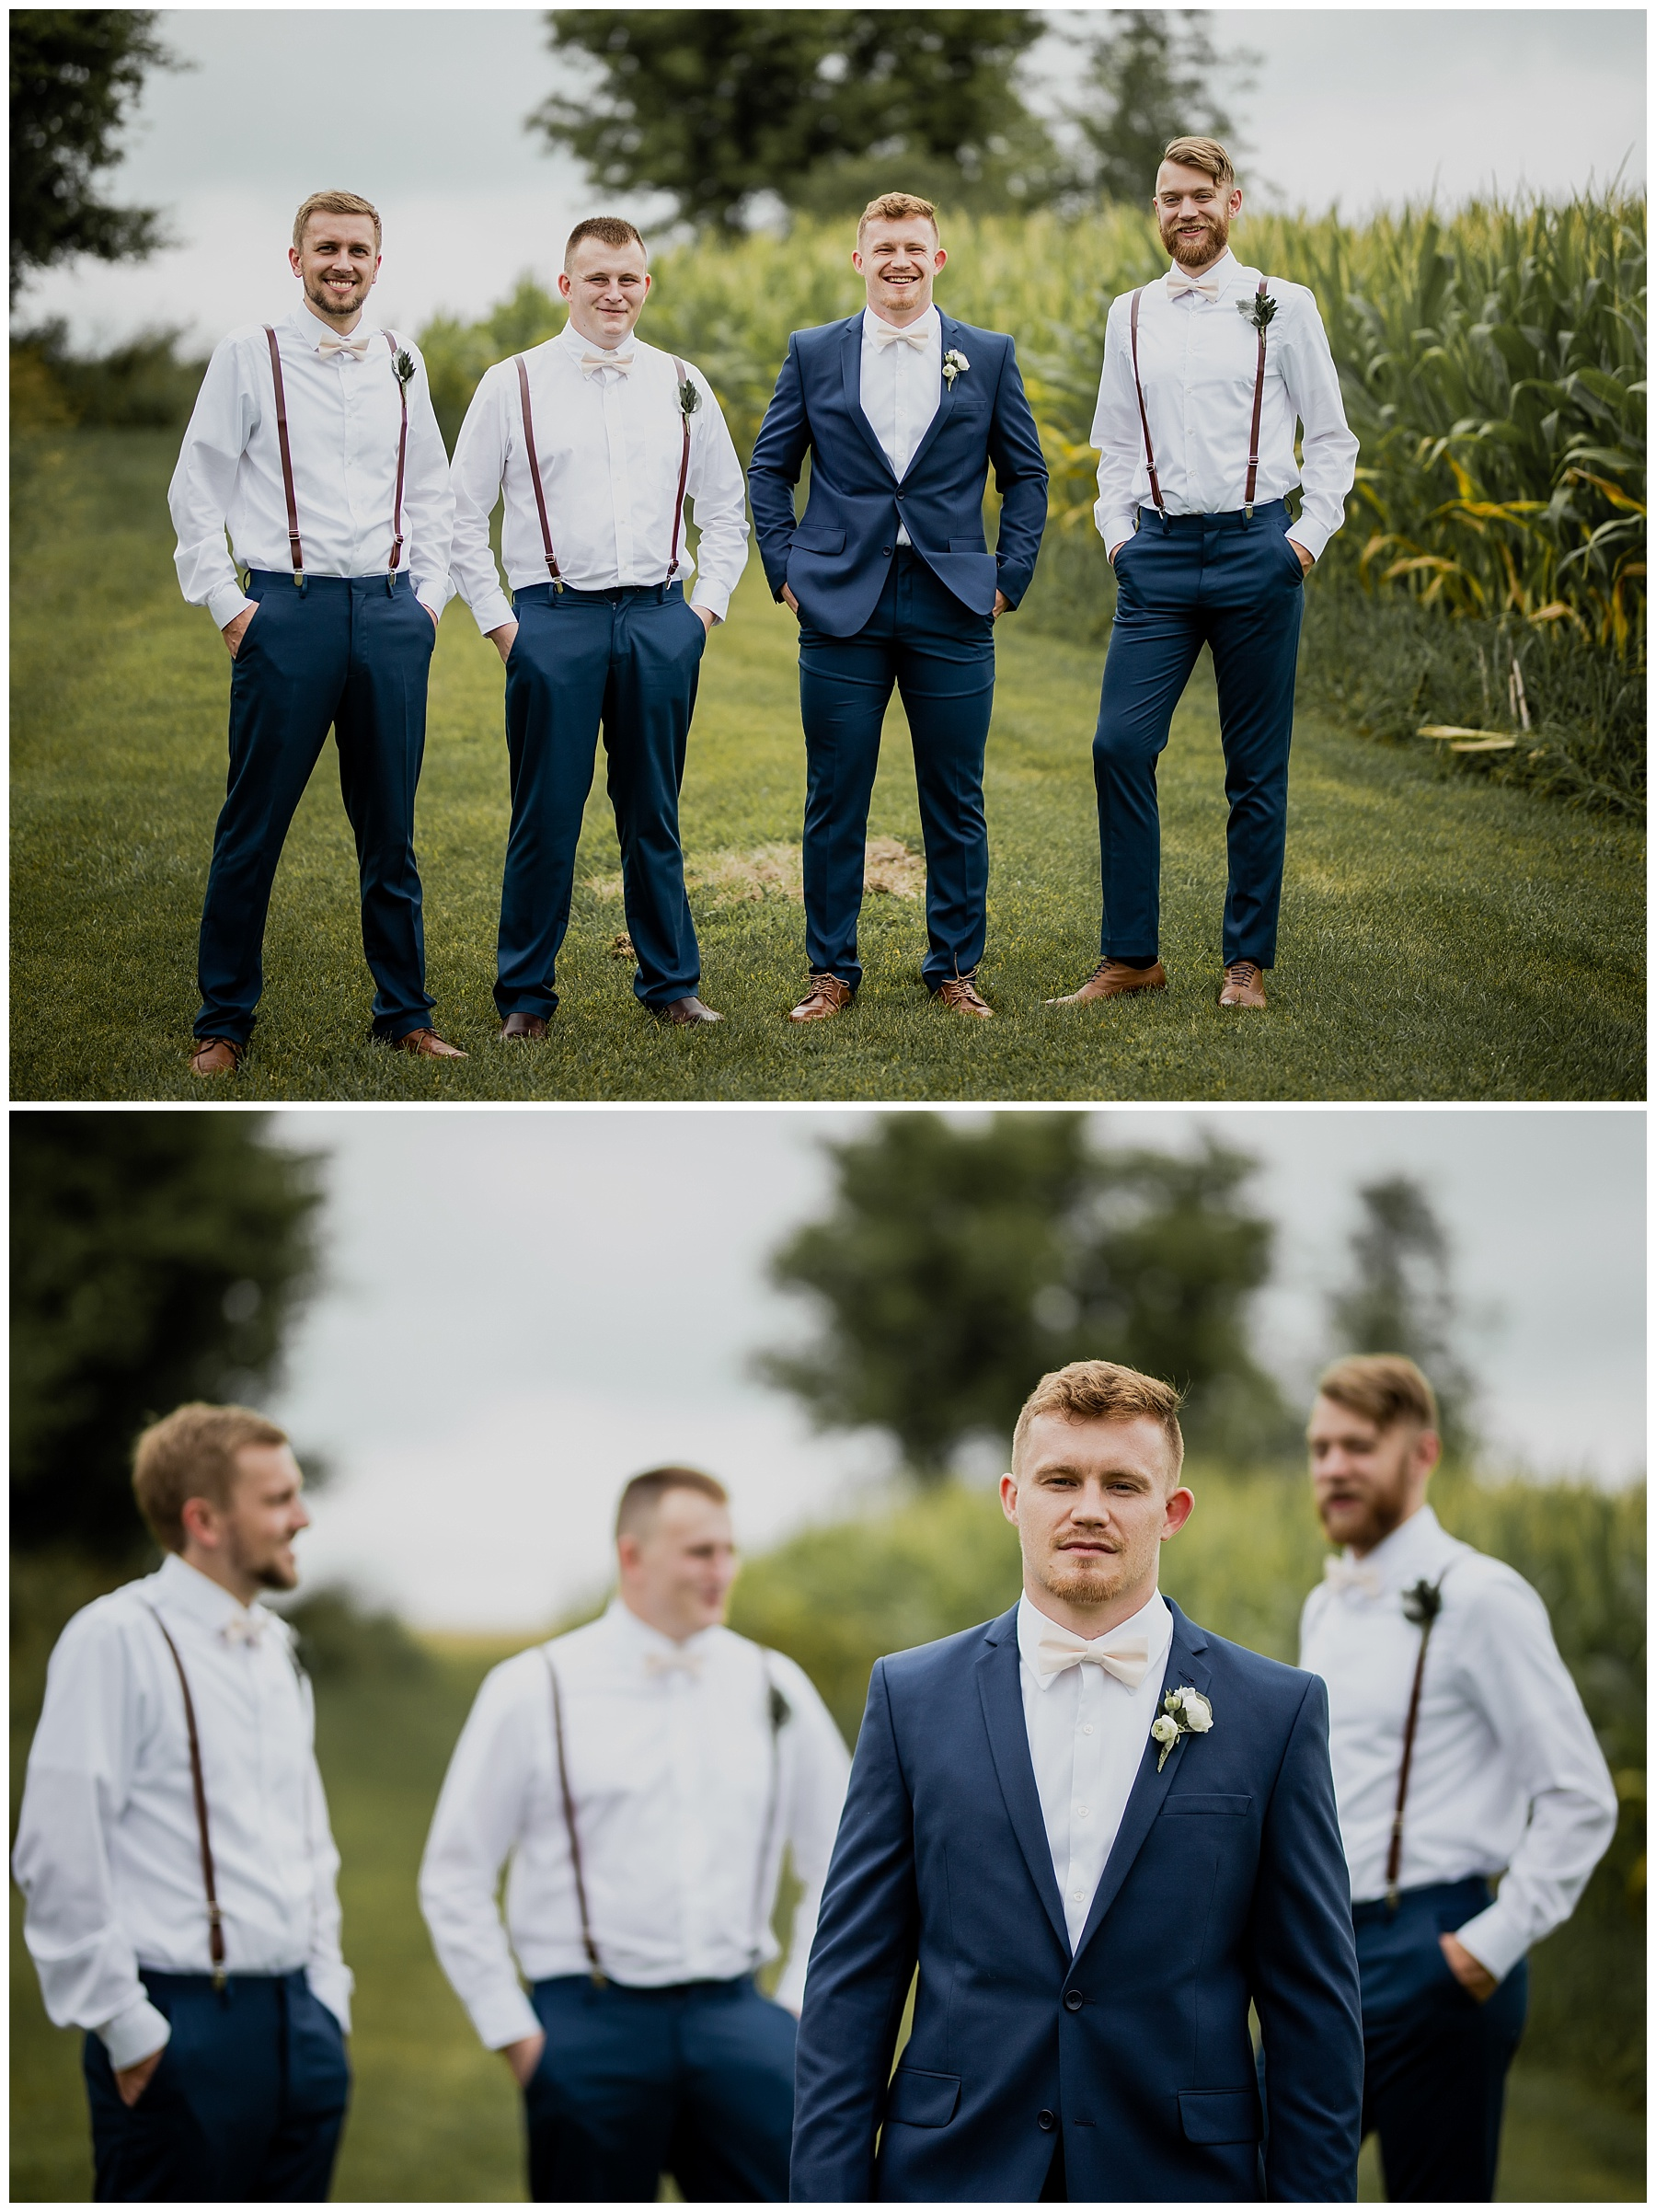 WISCONSIN WEDDING PHOTOGRAPHER 14.jpg